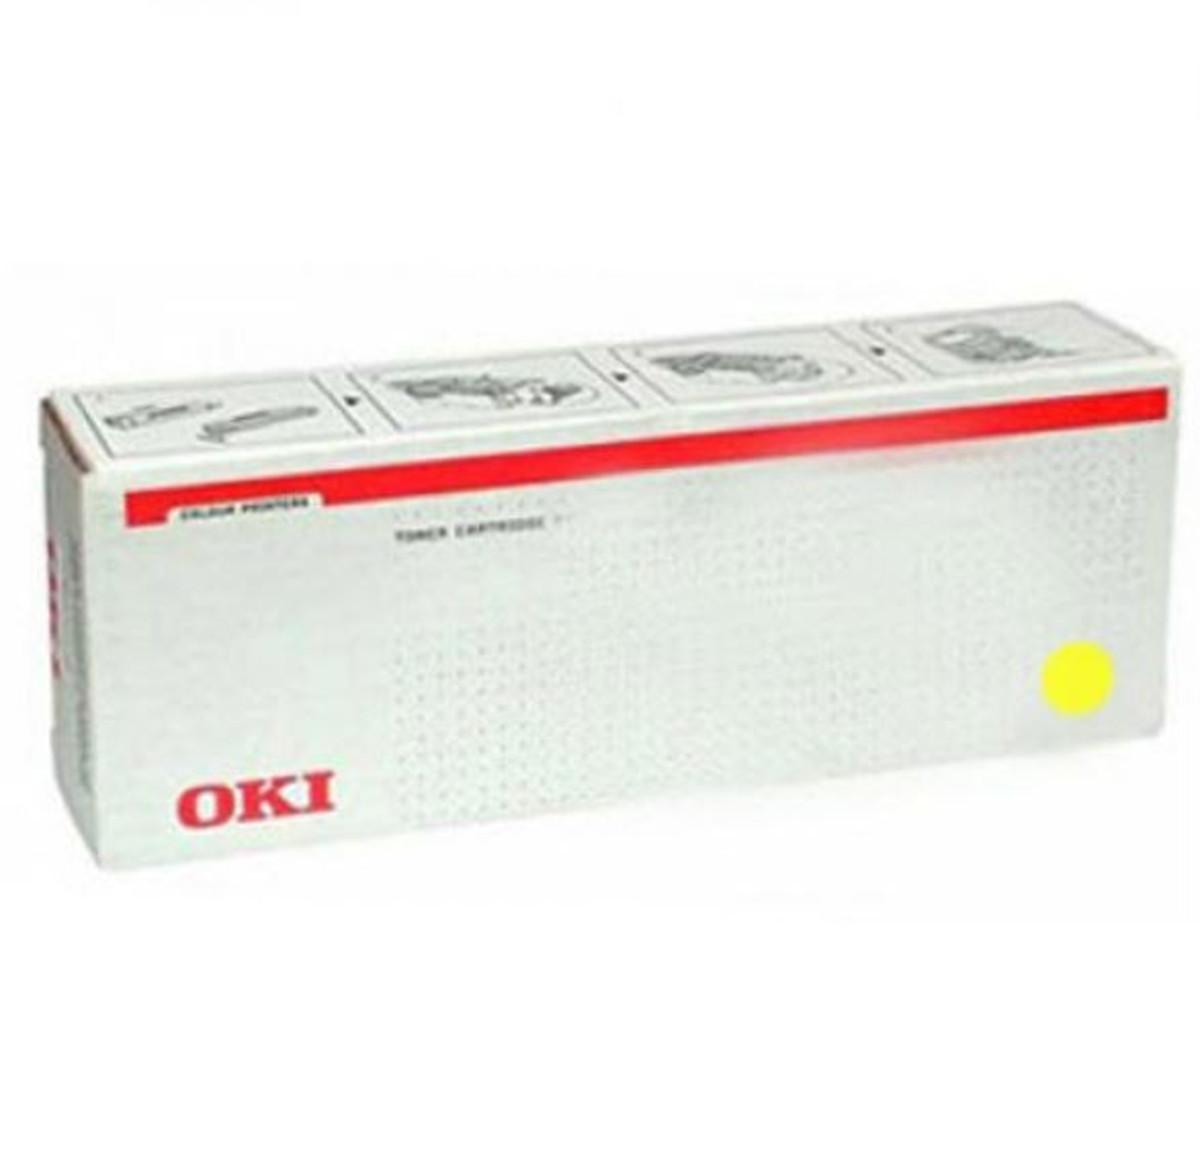 Oki 44844525 Yellow Toner Cartridge